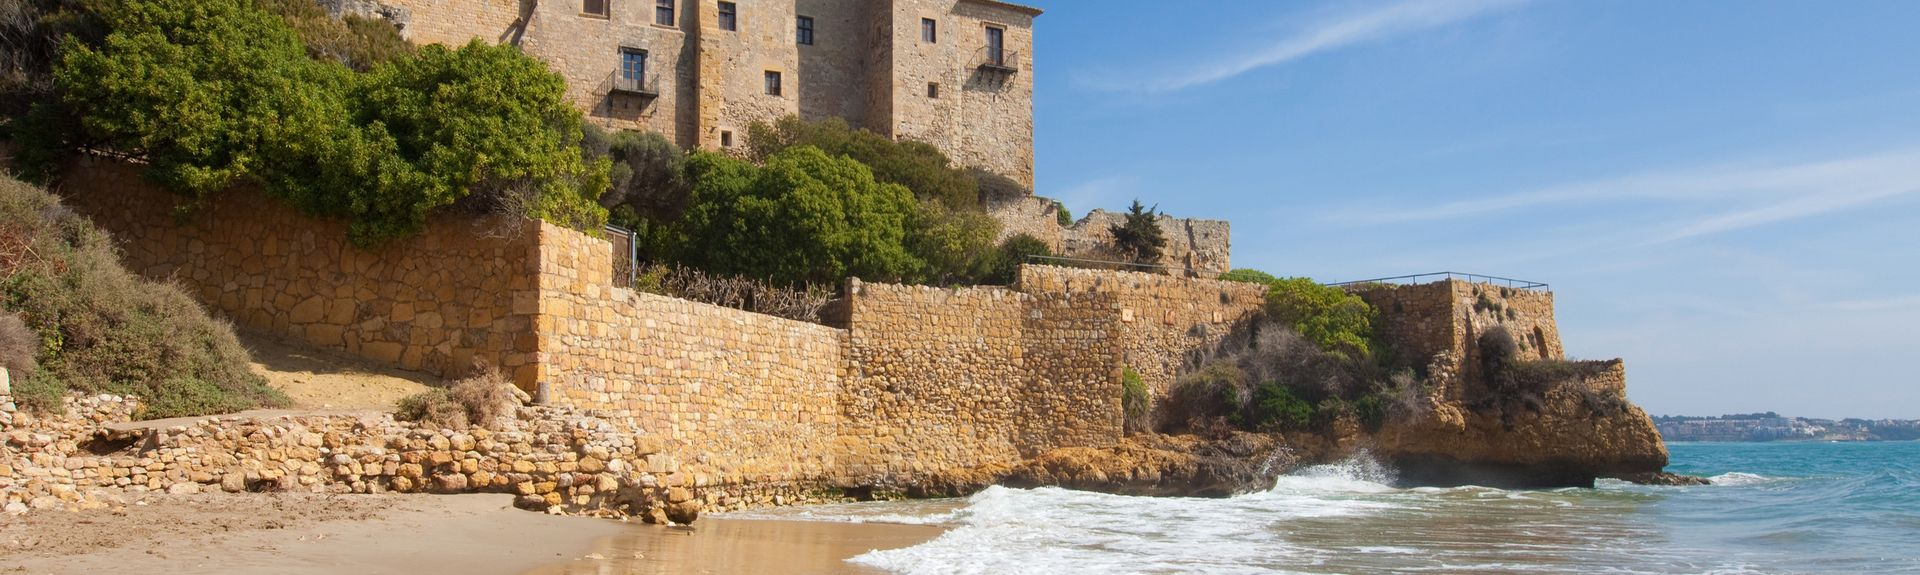 Tarragone, Tarragone, Catalogne, Espagne